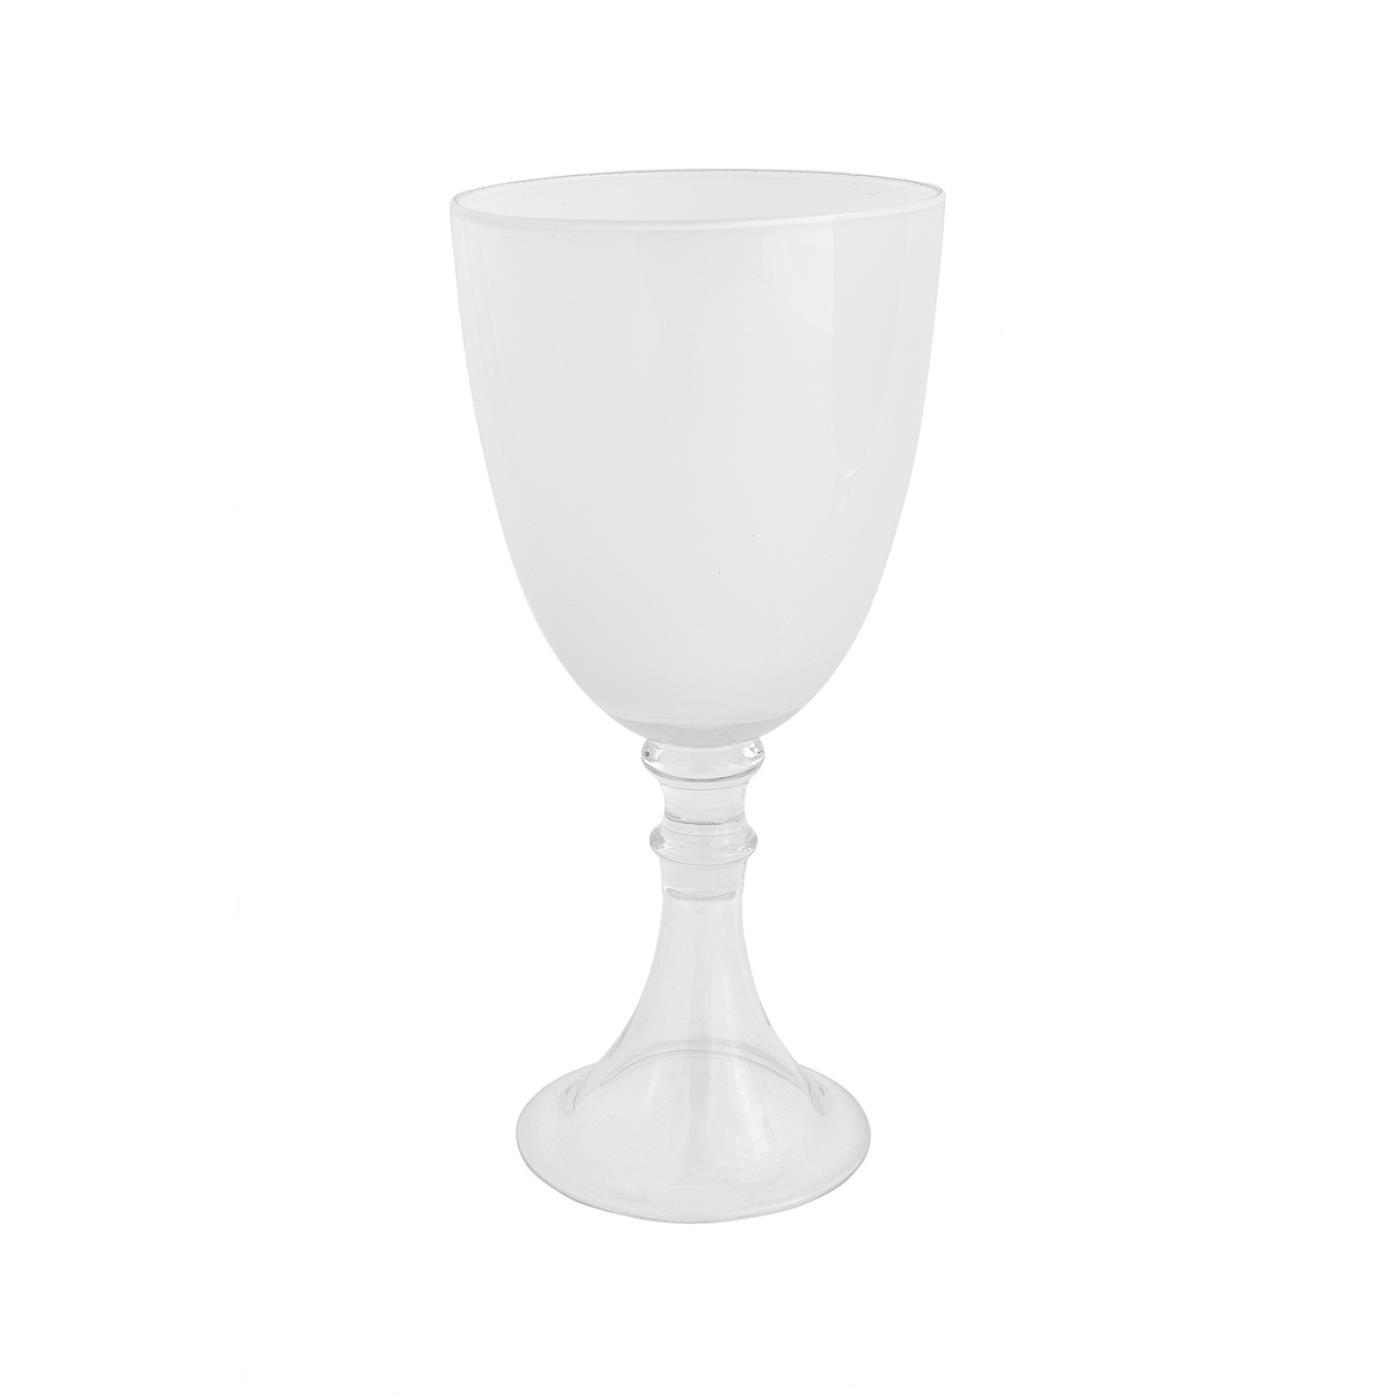 Veranda White - Goblet 16 oz